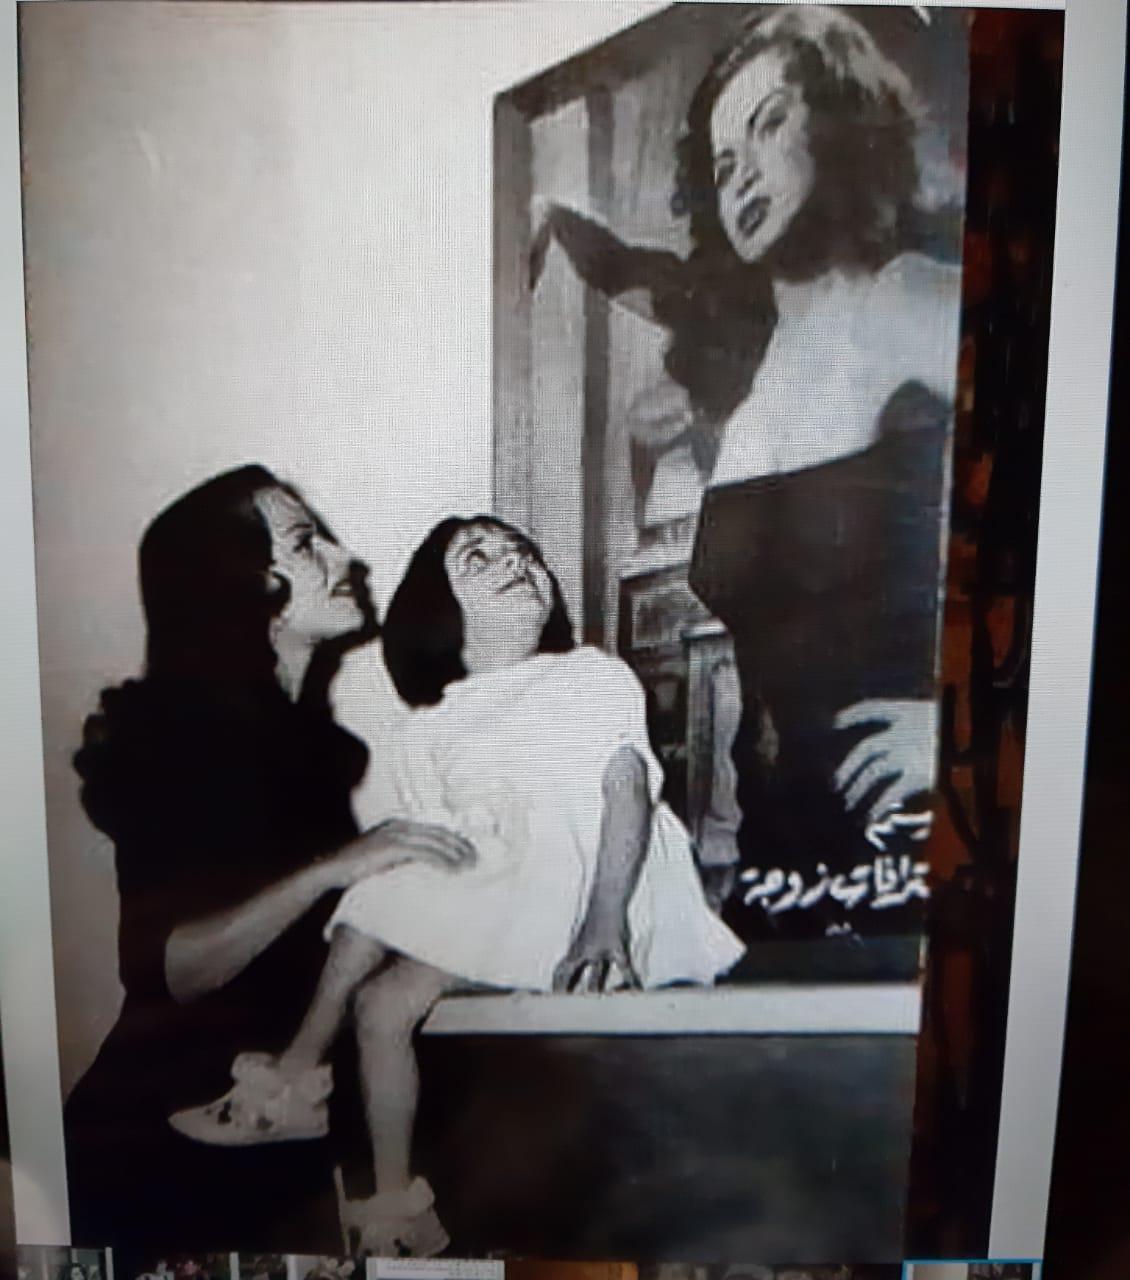 مارلين مونرو الشرق - هند رستم (10)